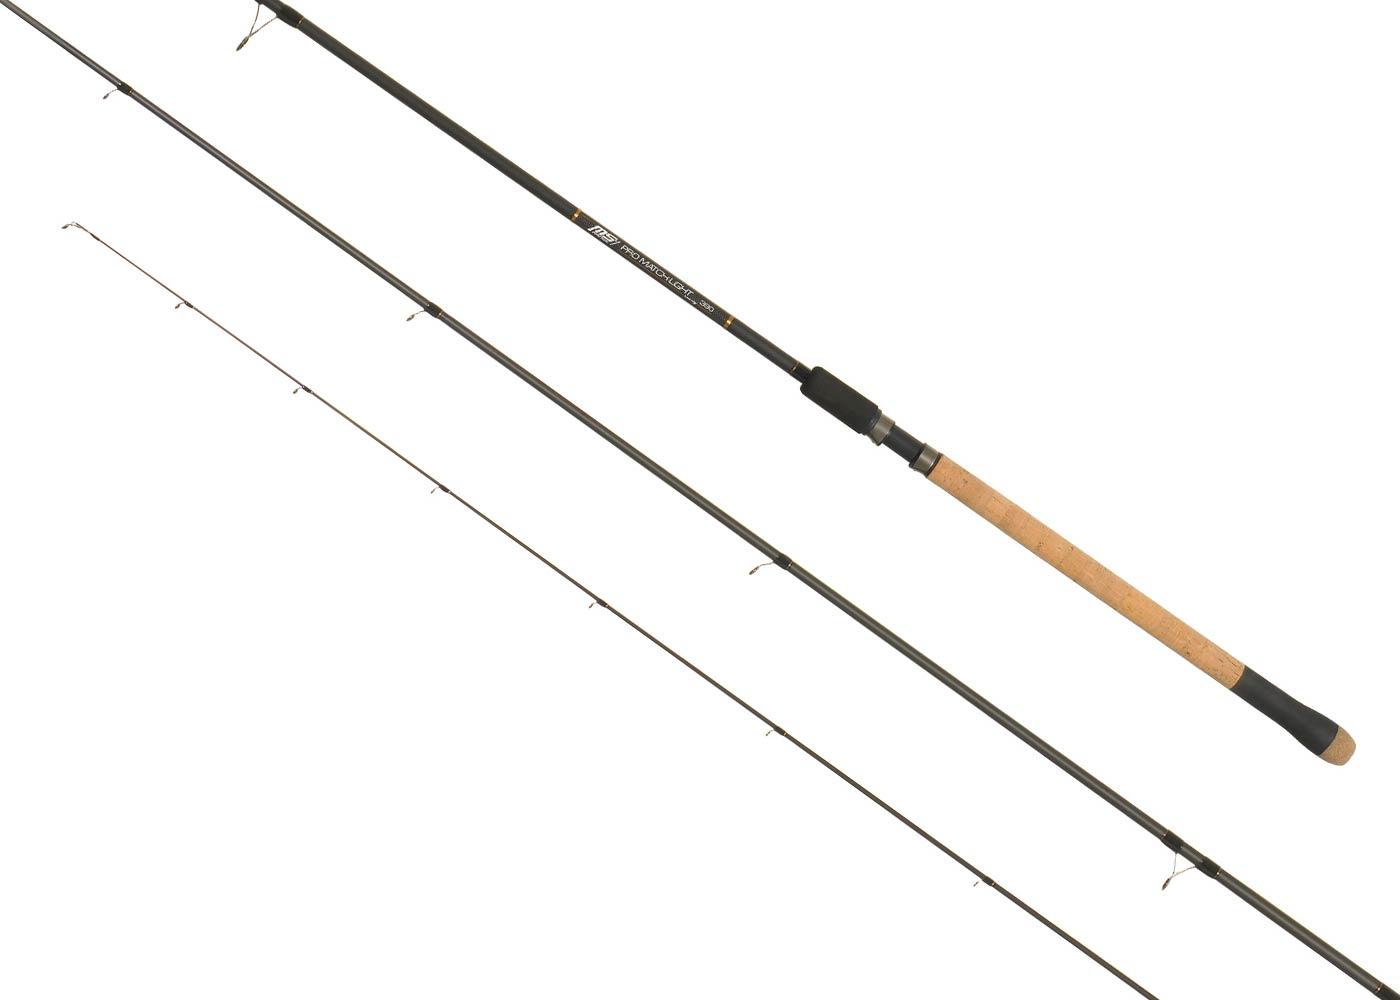 MS Range Pro Match HEAVY 360cm 30g